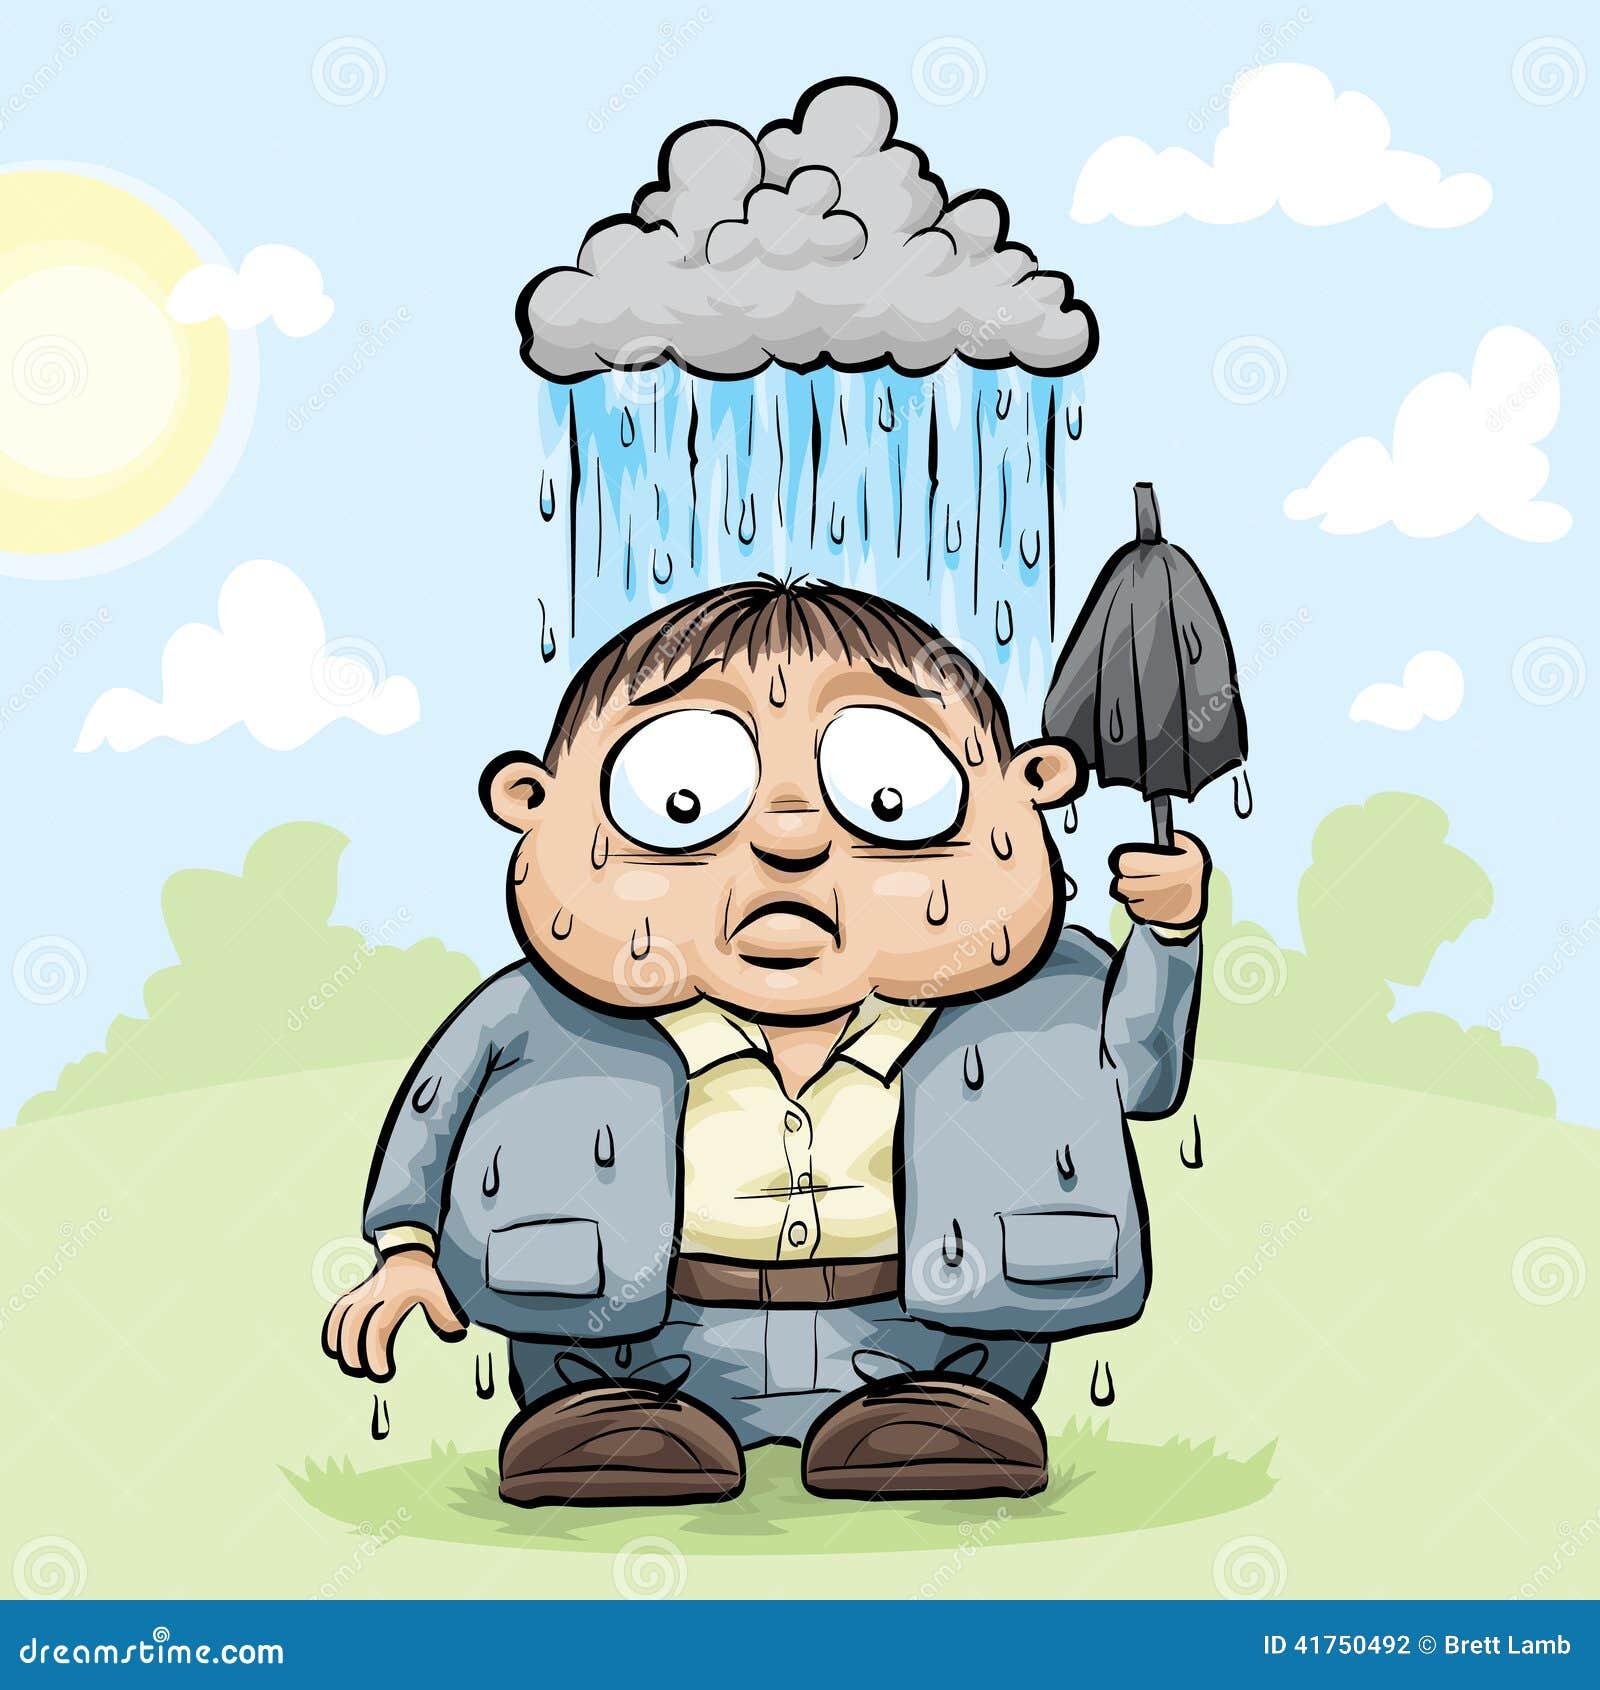 Personal Rain Cloud stock illustration. Illustration of ...